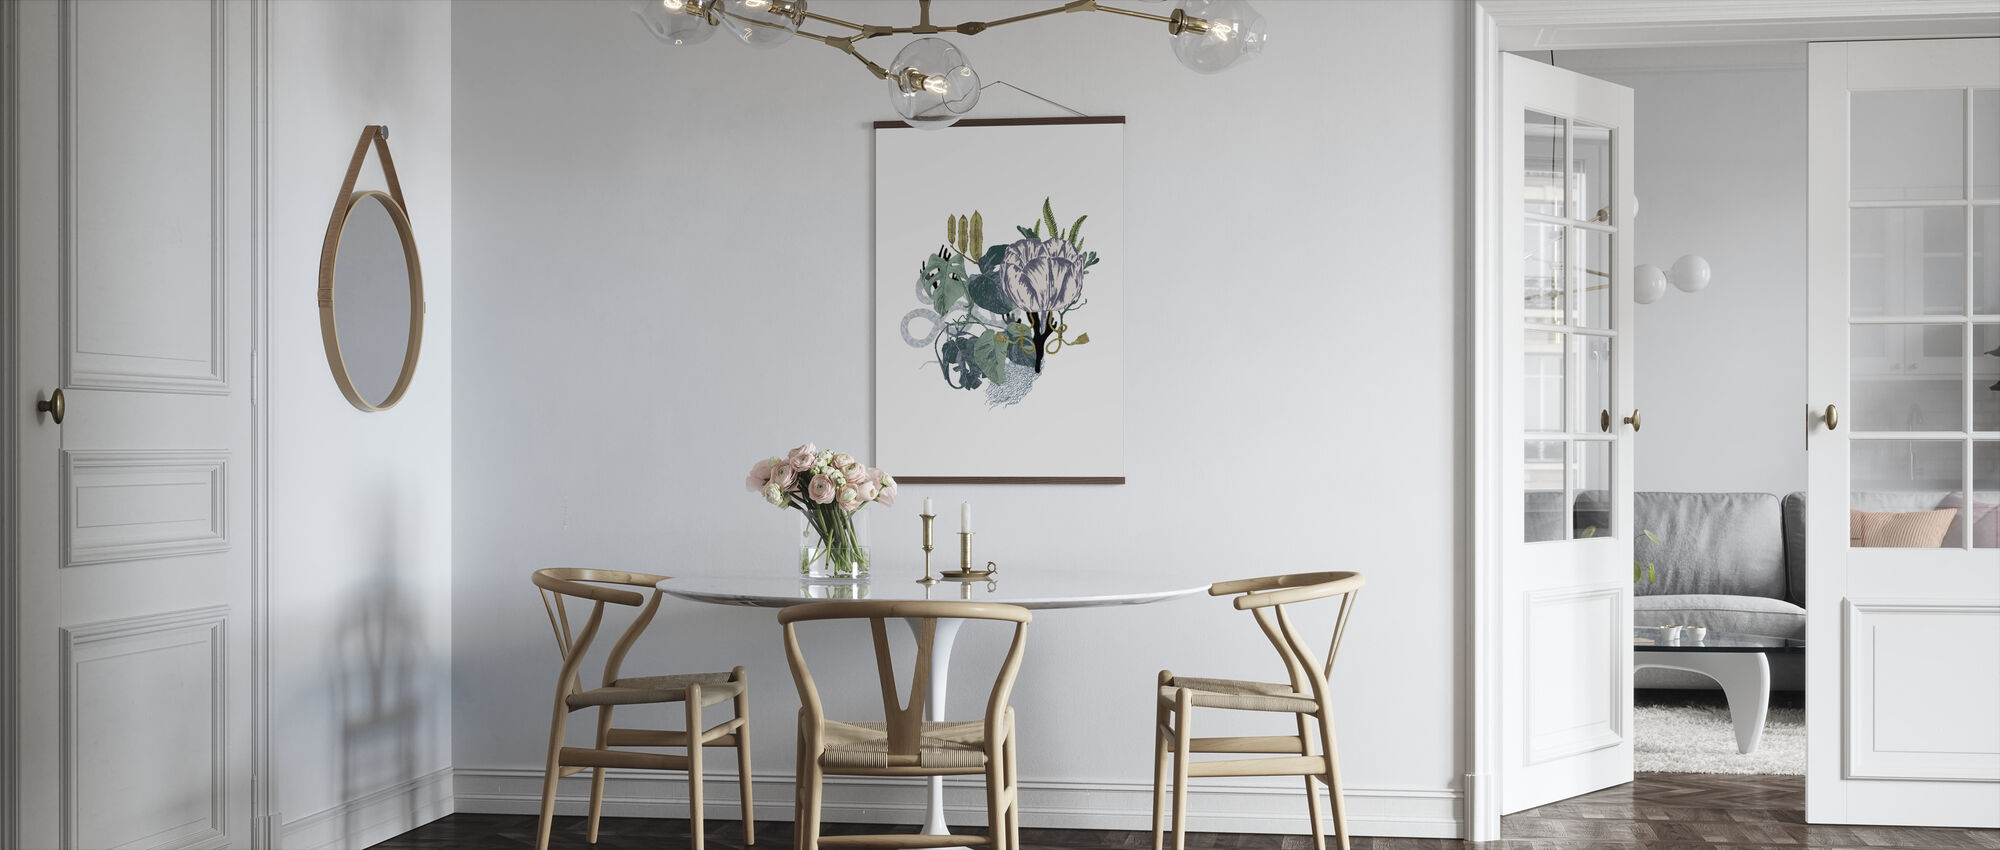 Pale Tulip - Poster - Kitchen